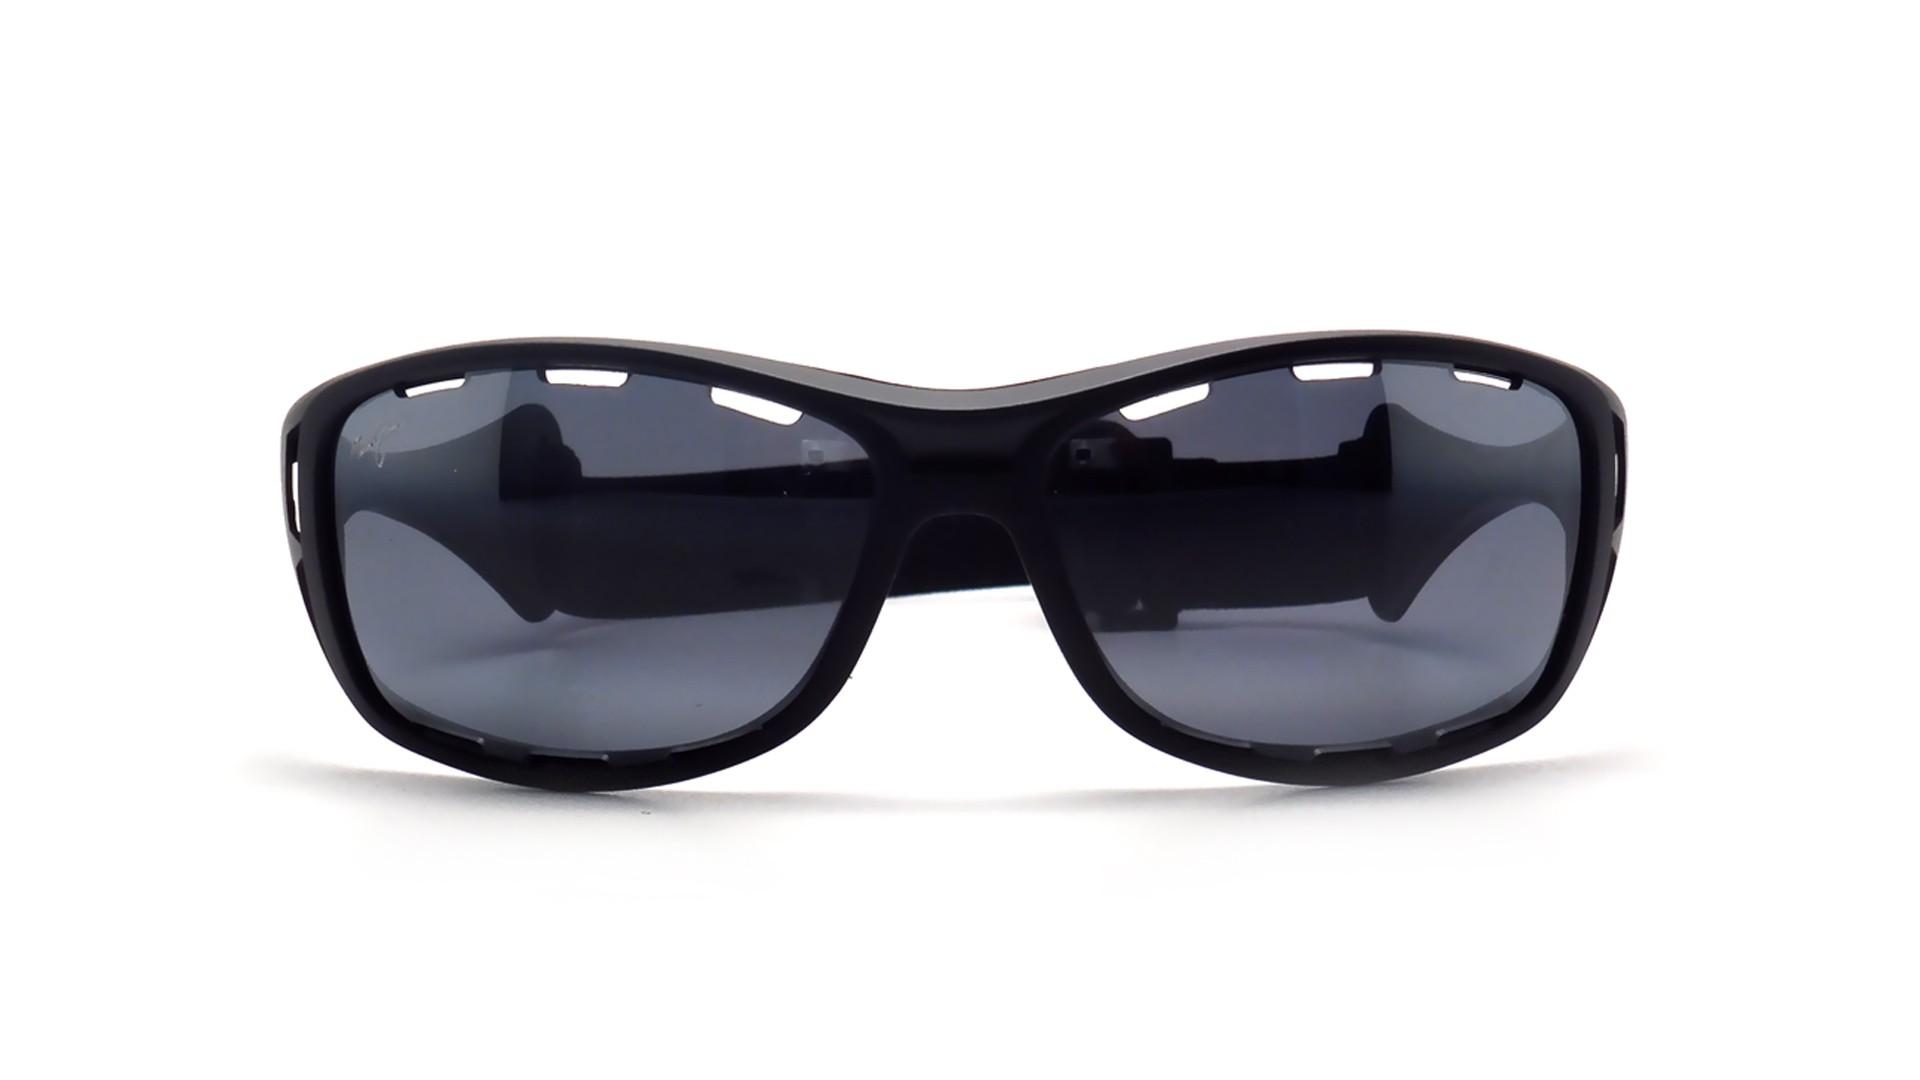 d3d42b6bd41 Sunglasses Maui Jim Waterman Black Matte Neutral Grey 410 2M 63 Large  Polarized Mirror